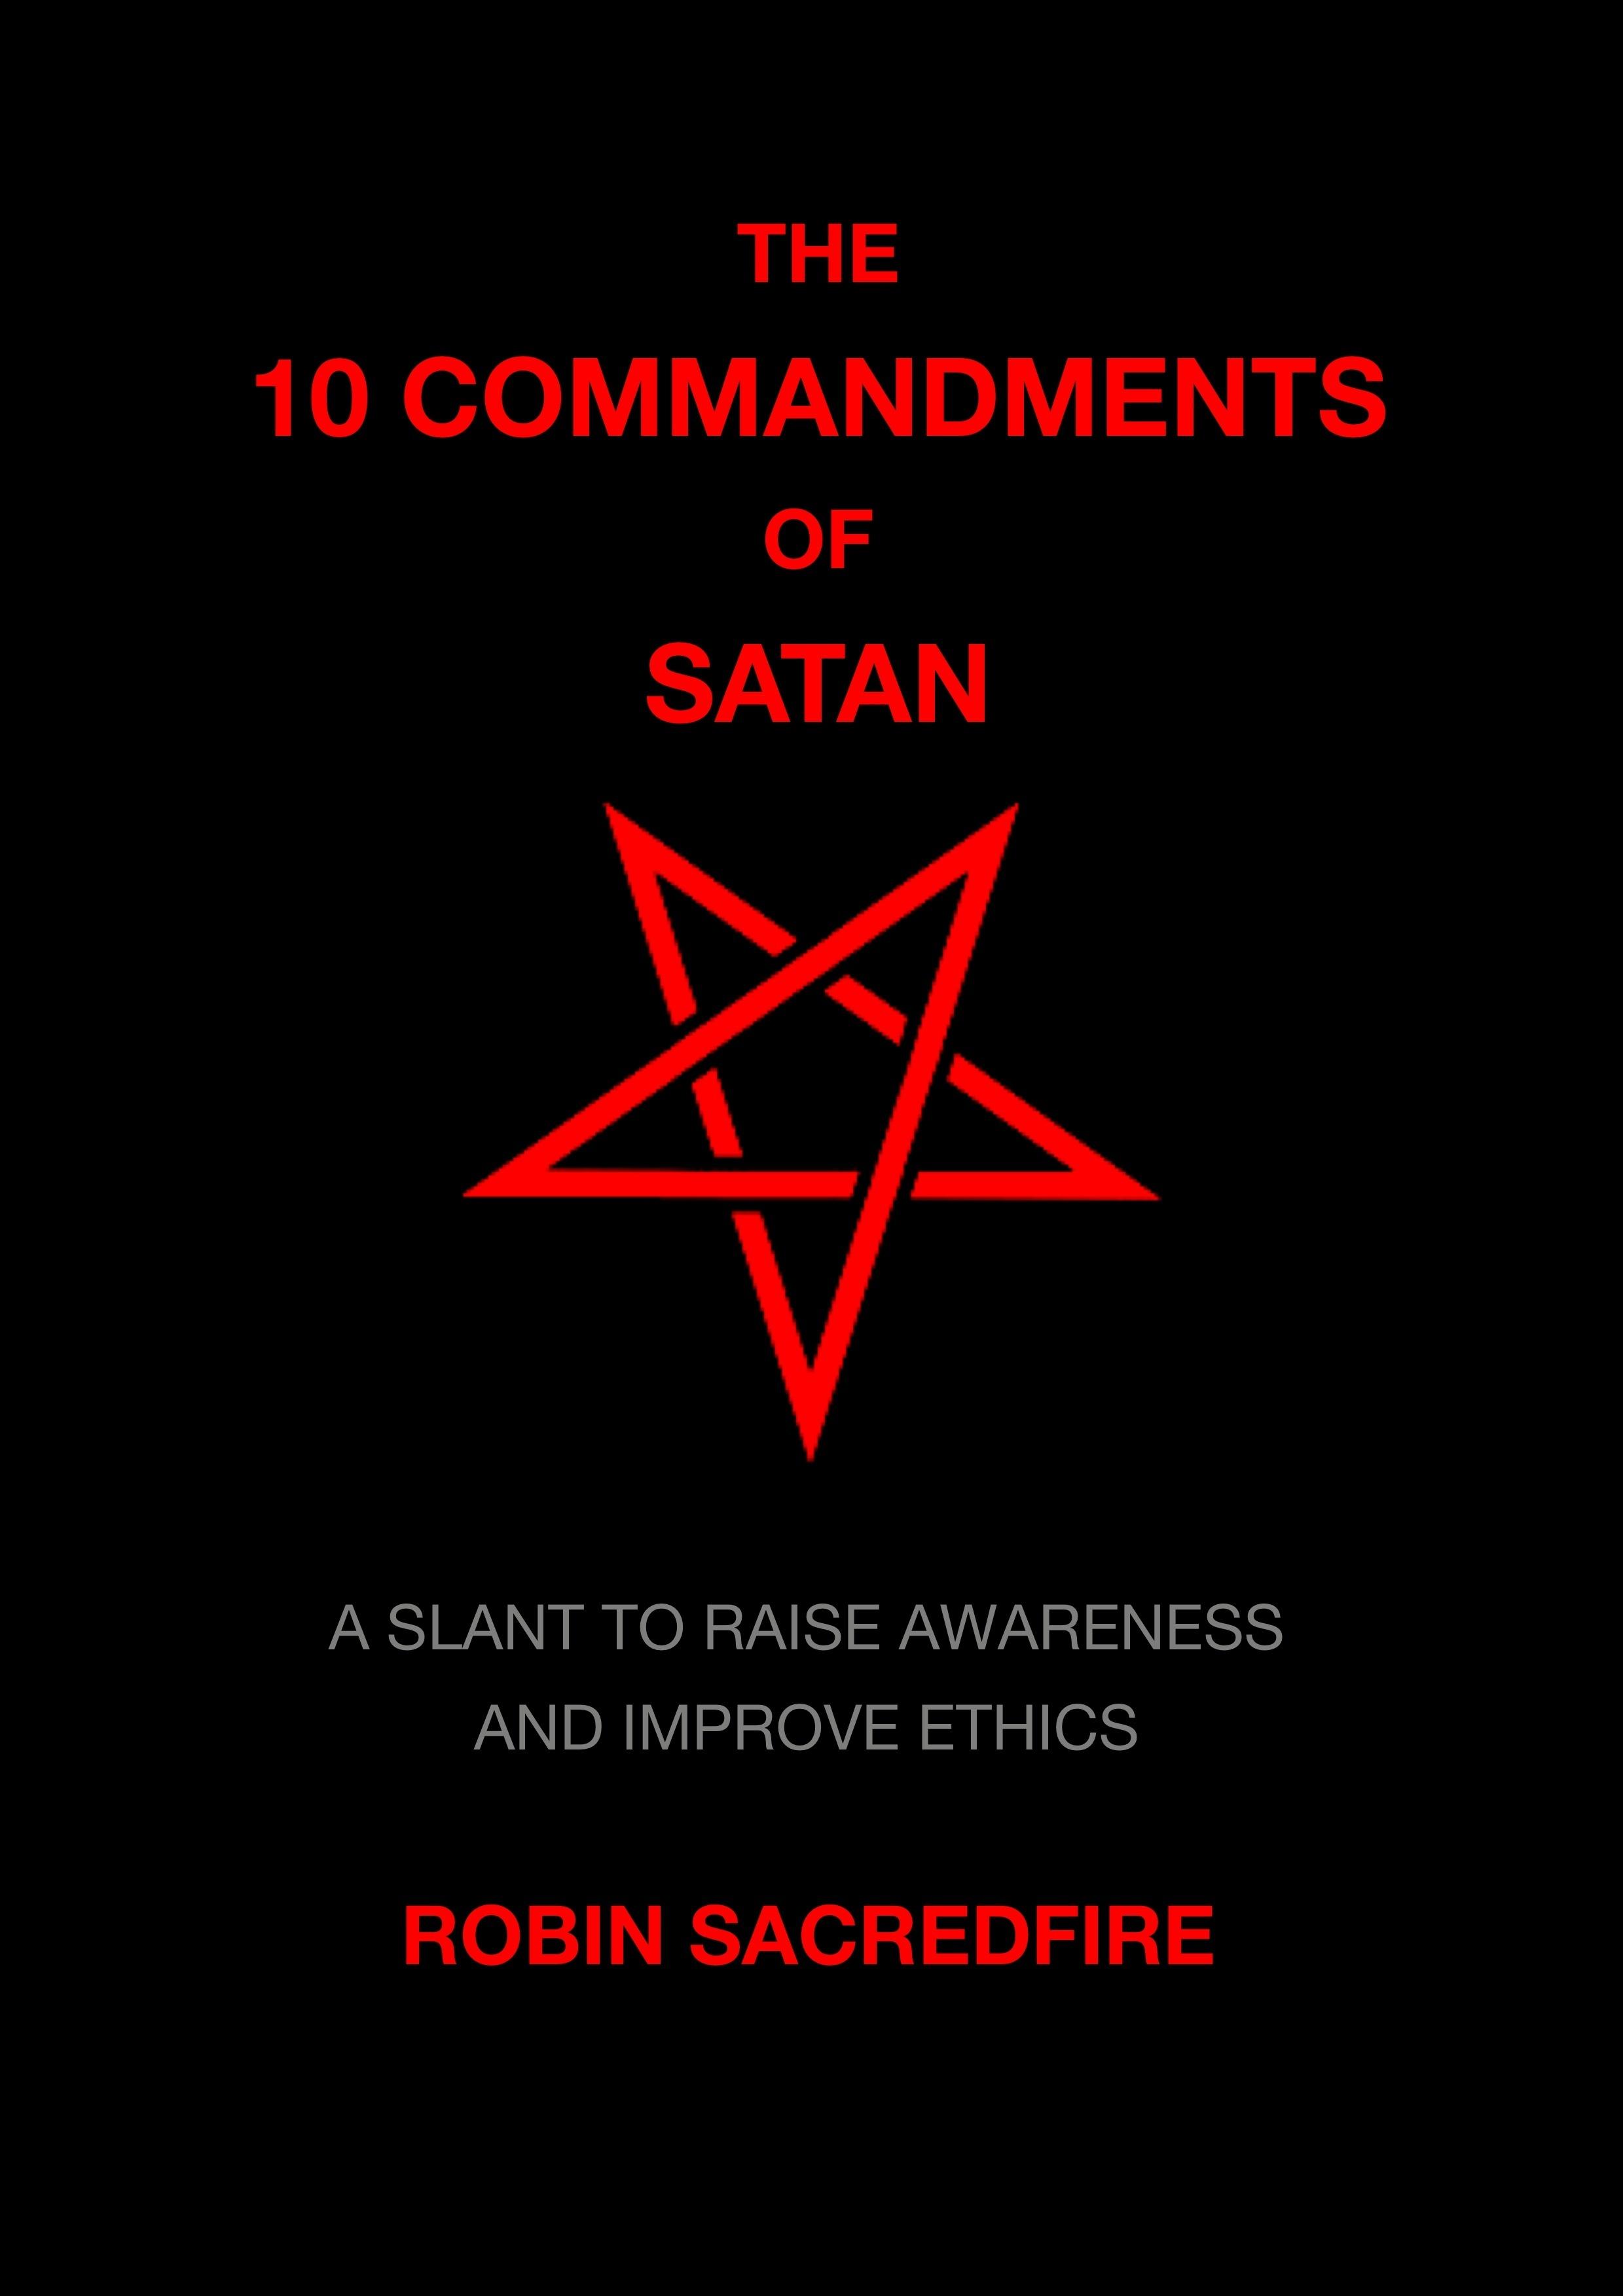 The 10 Commandments of Satan: A Slant to Raise Awareness and Improve Ethics